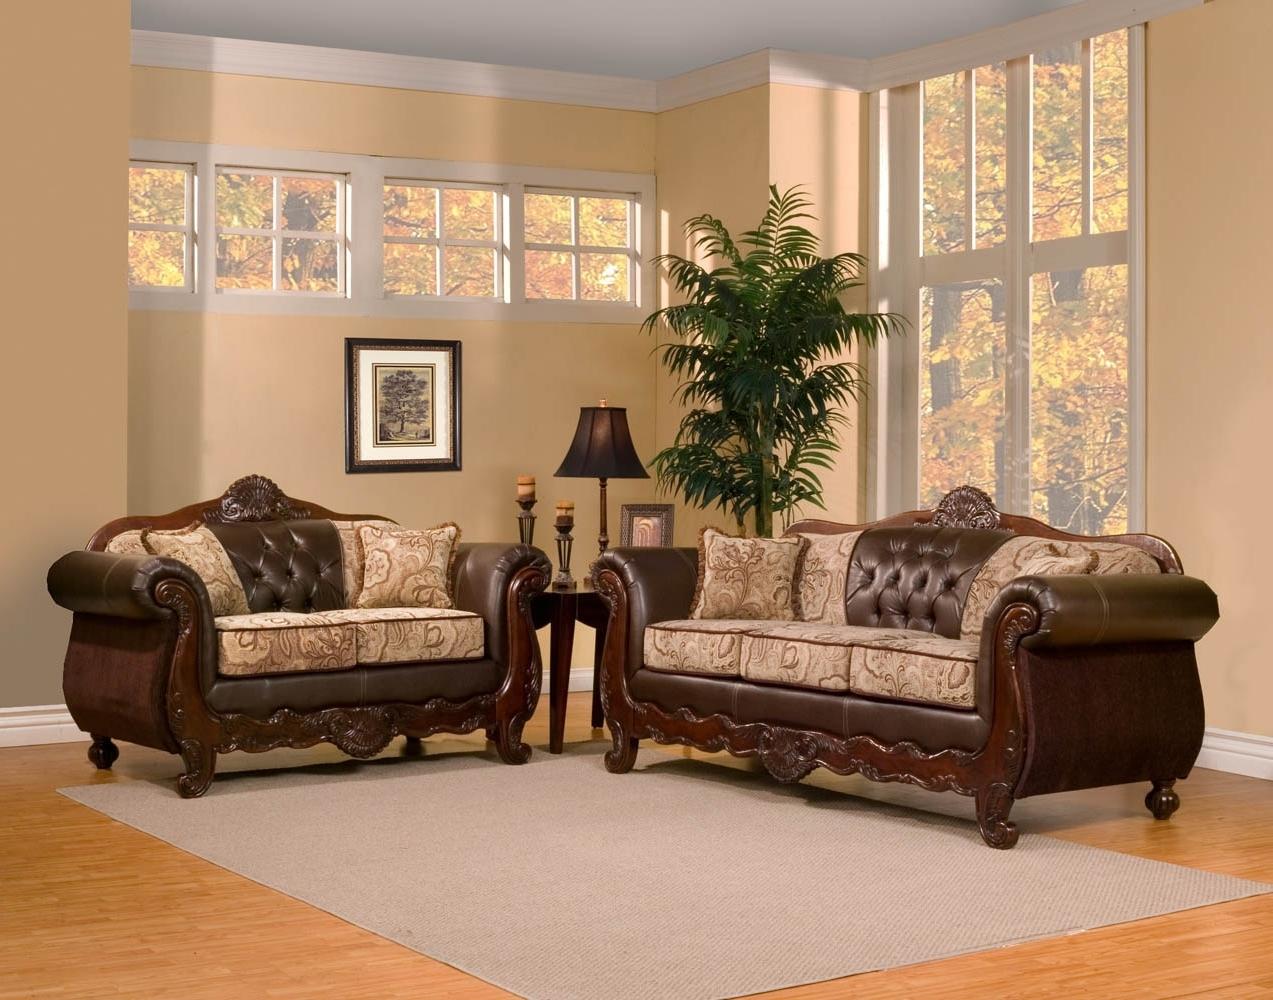 Well-liked Piece Traditional Elegant Sofa Set regarding Elegant Sofas And Chairs